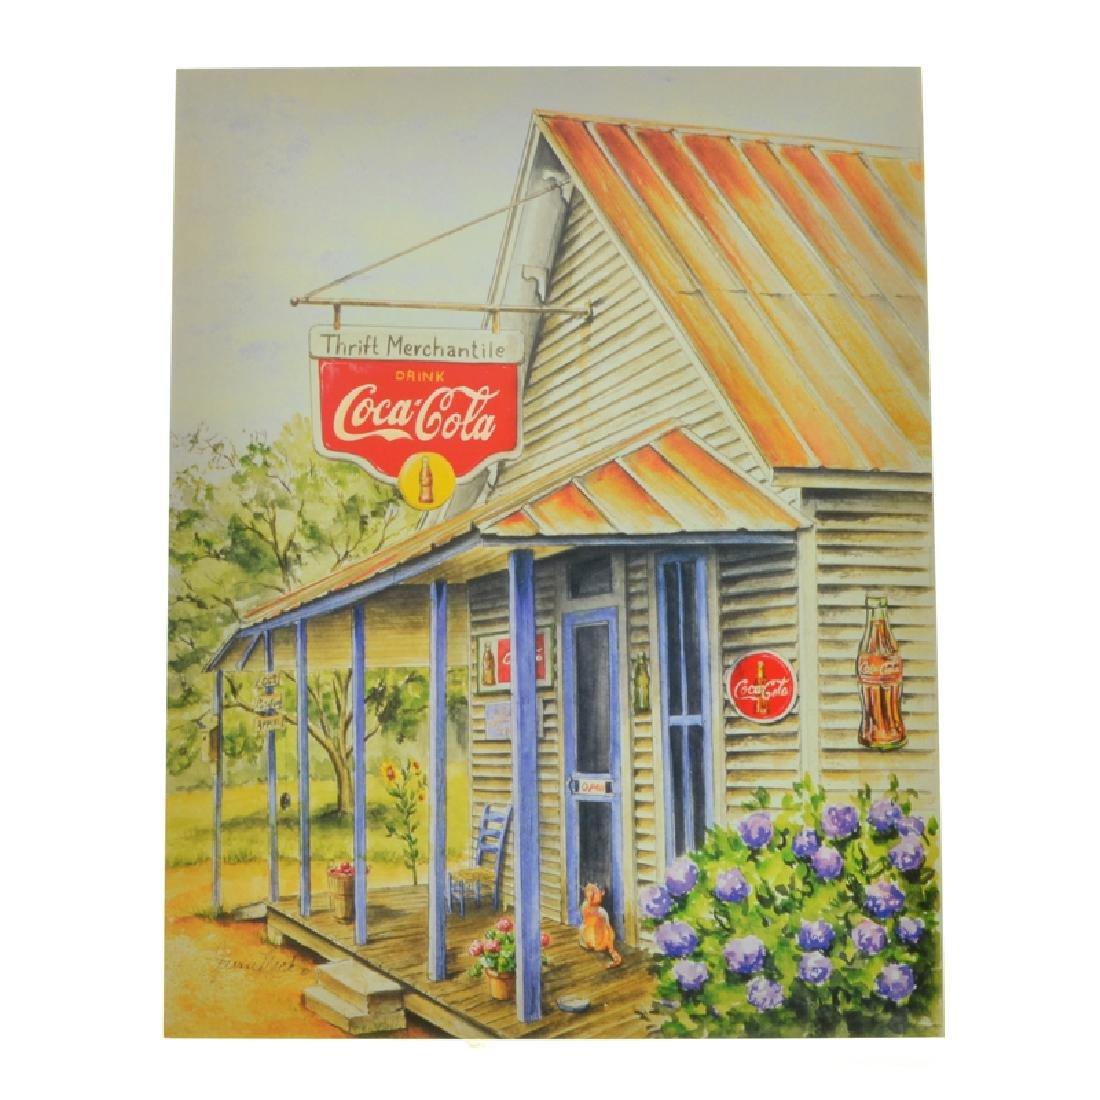 Collectable Coca Cola Advertising Poster (7.5'' x